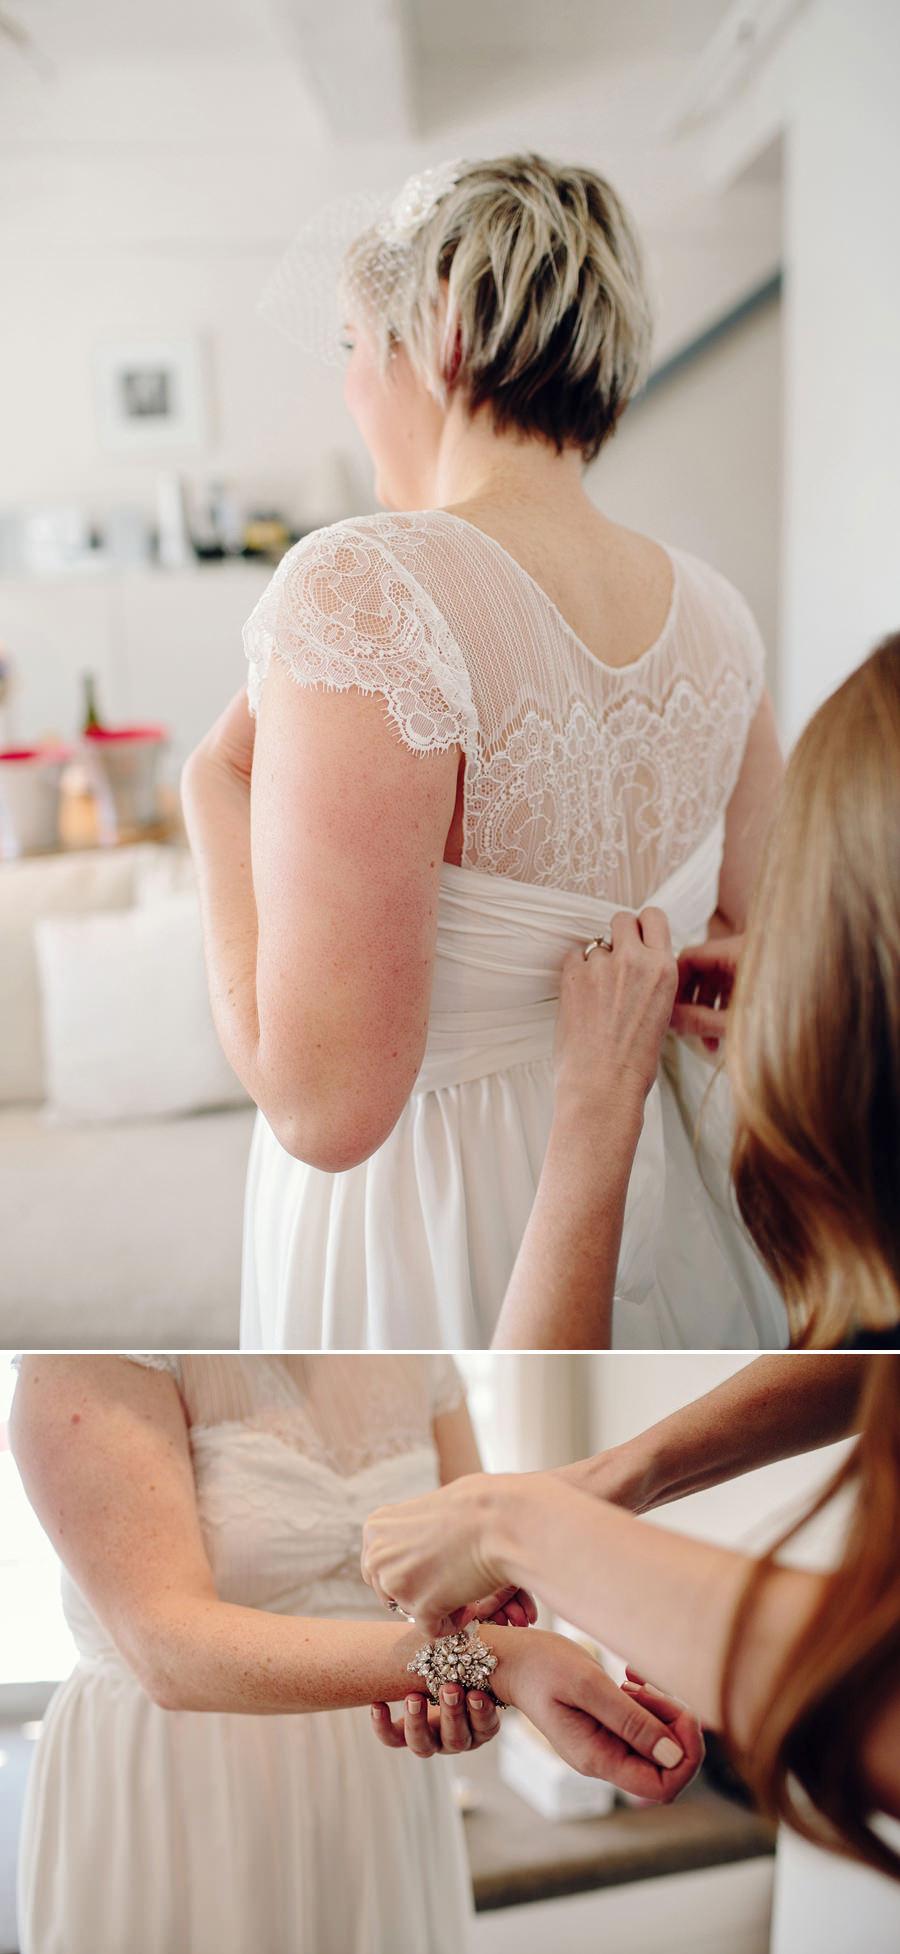 Sebel Wedding Photographers: Bride getting dressed